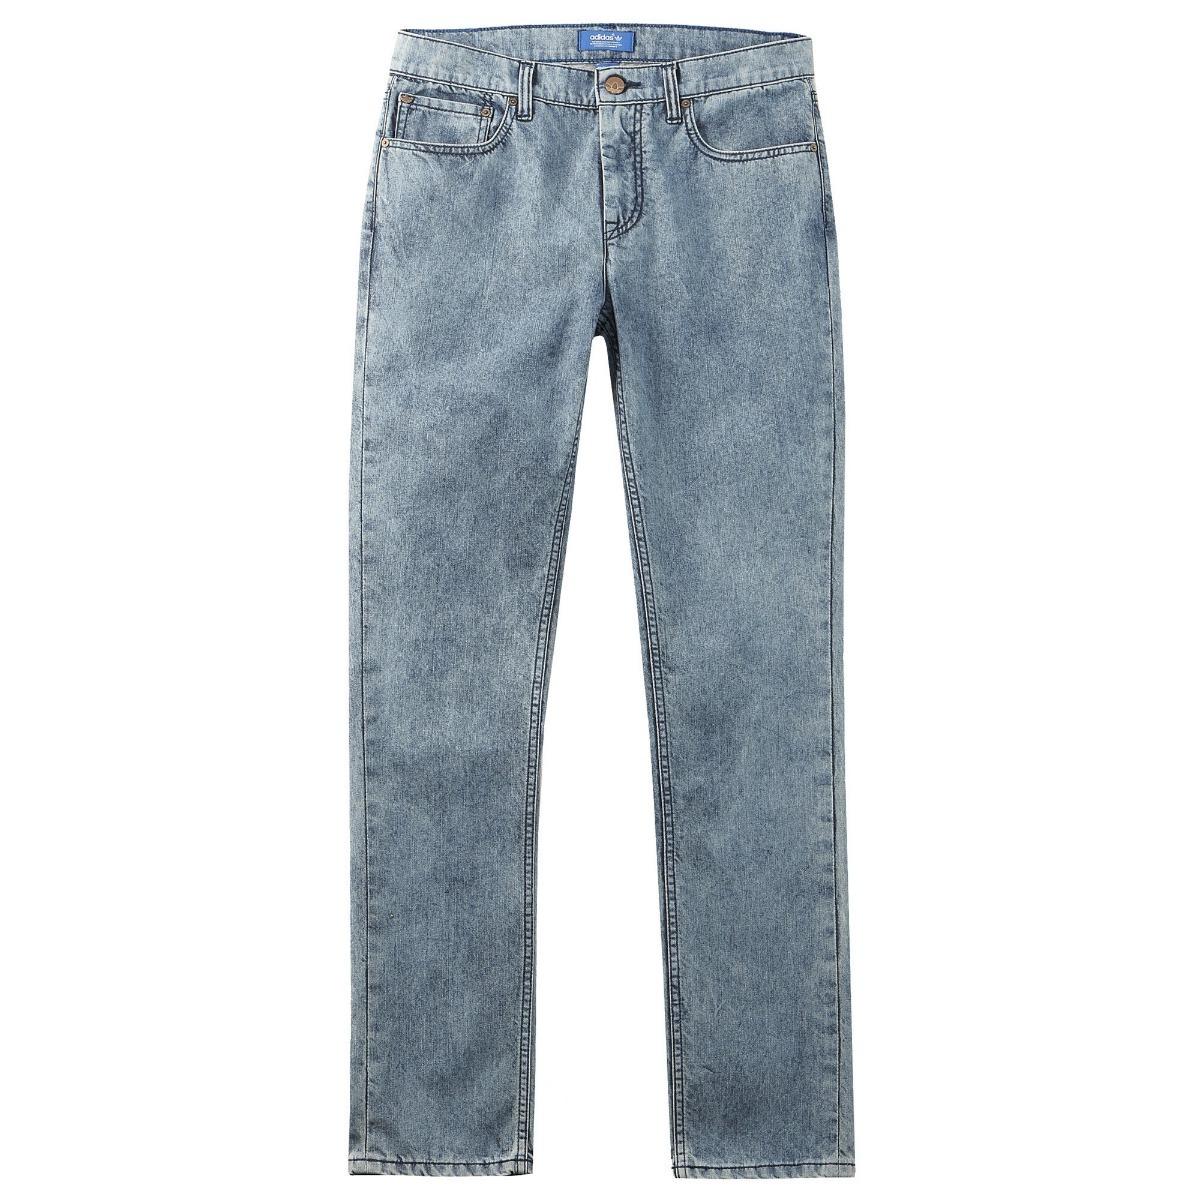 jean adidas originals m skinny fit f. Cargando zoom. 1731061bdd71